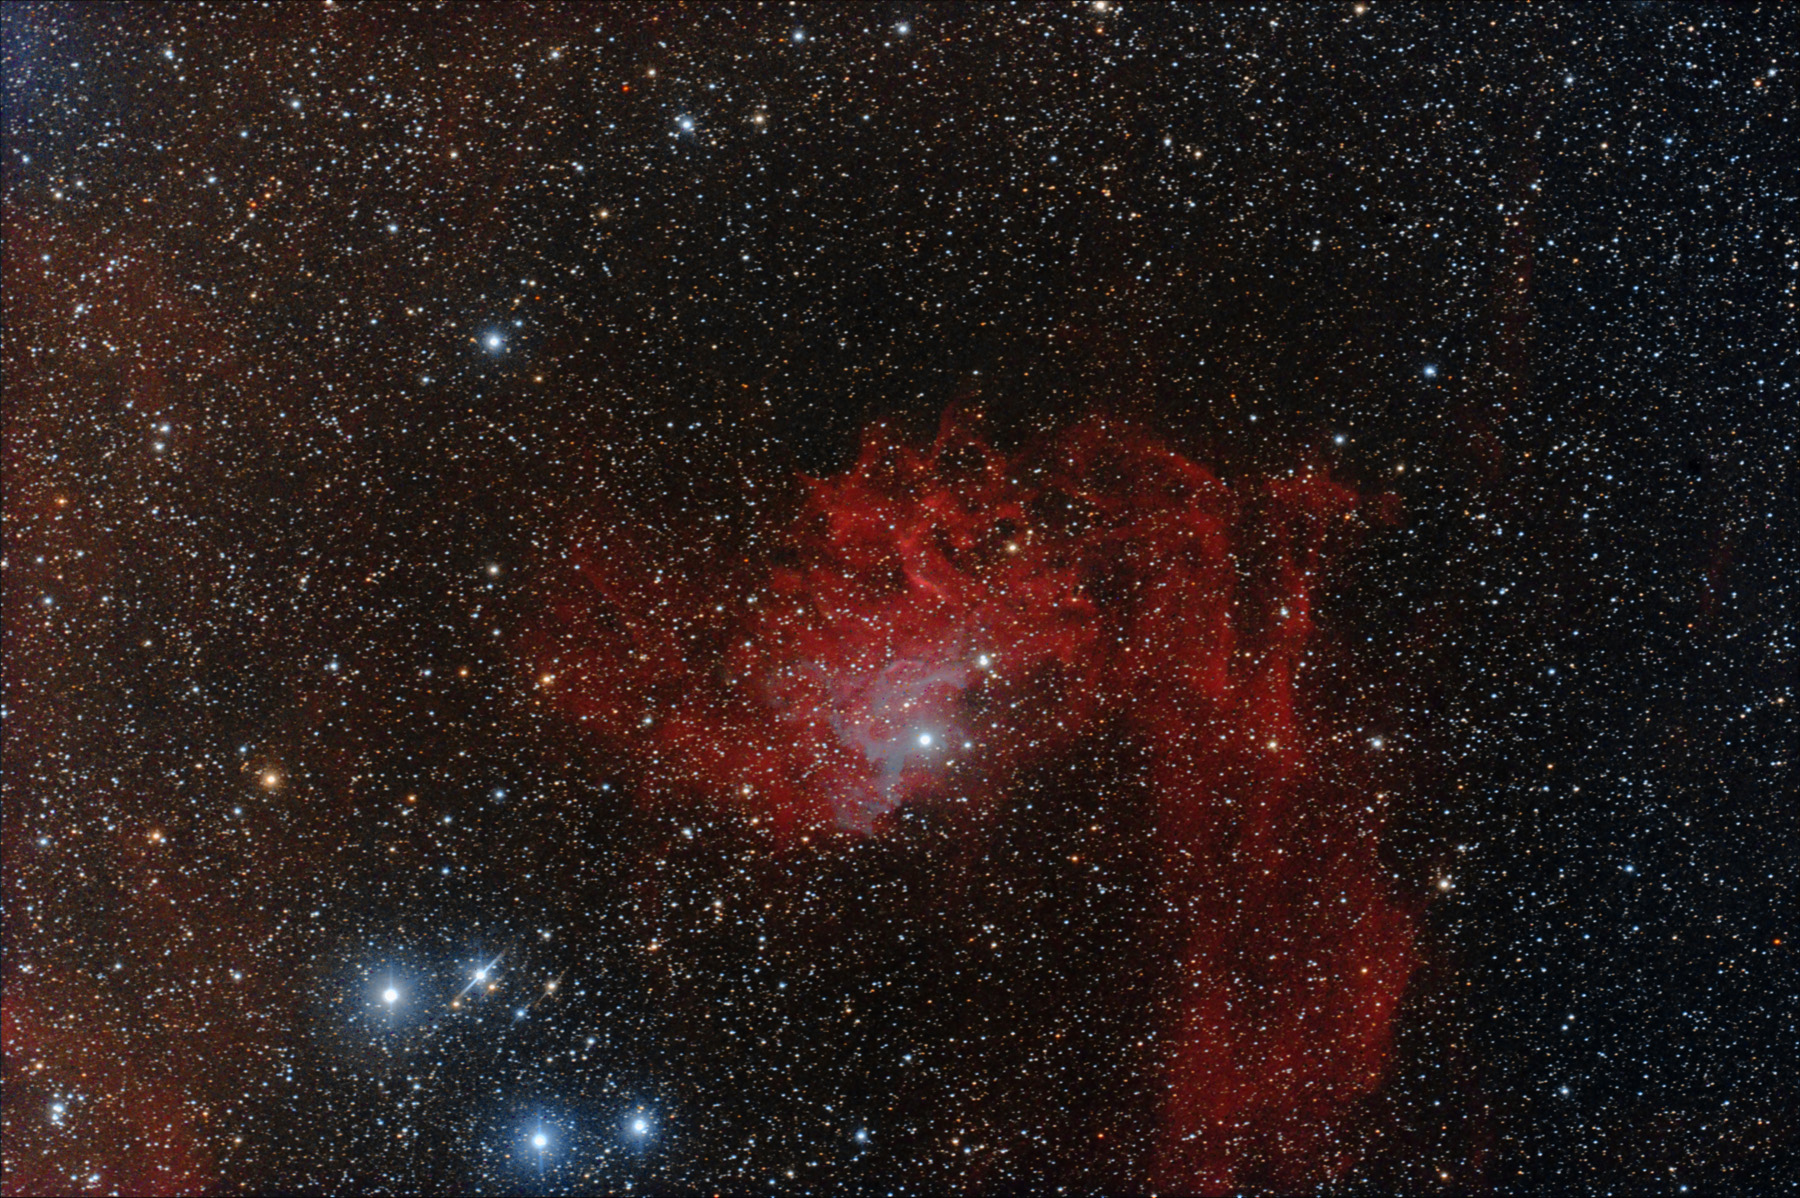 IC 405 Flaming star nebula